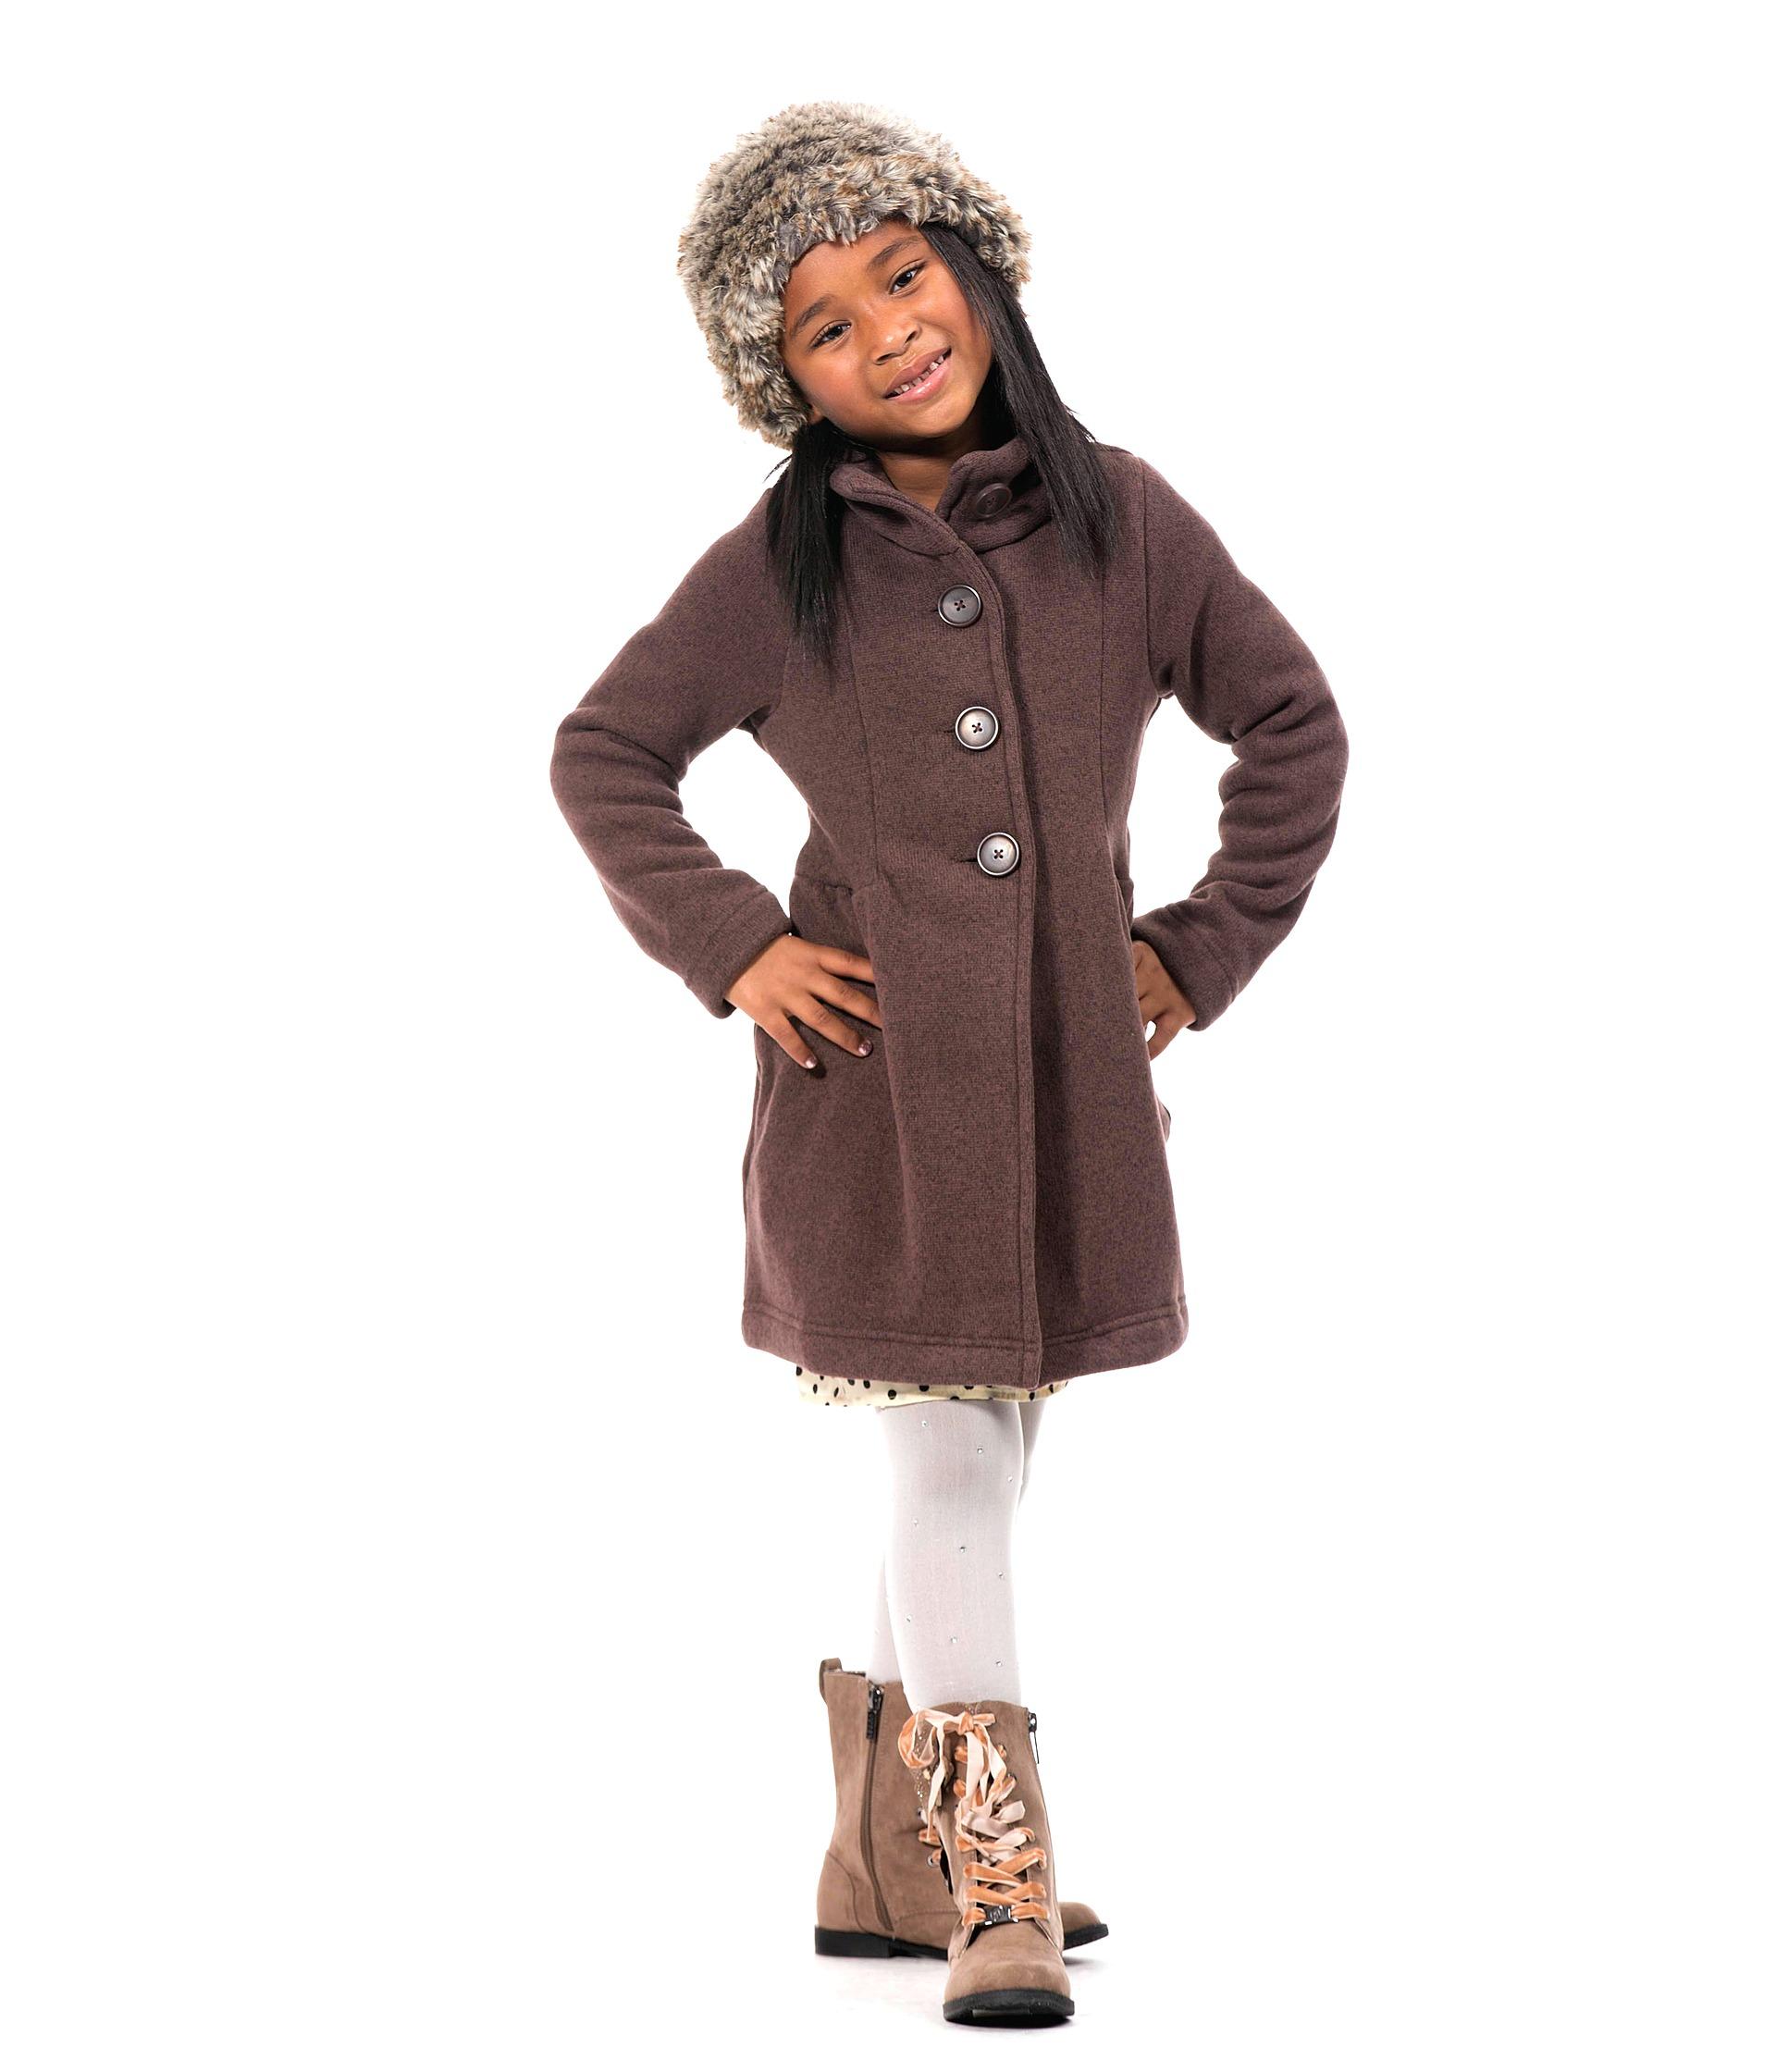 Jefferies Socks Dress Up Diamond Tights 2 Pack (Toddler/Little Kid